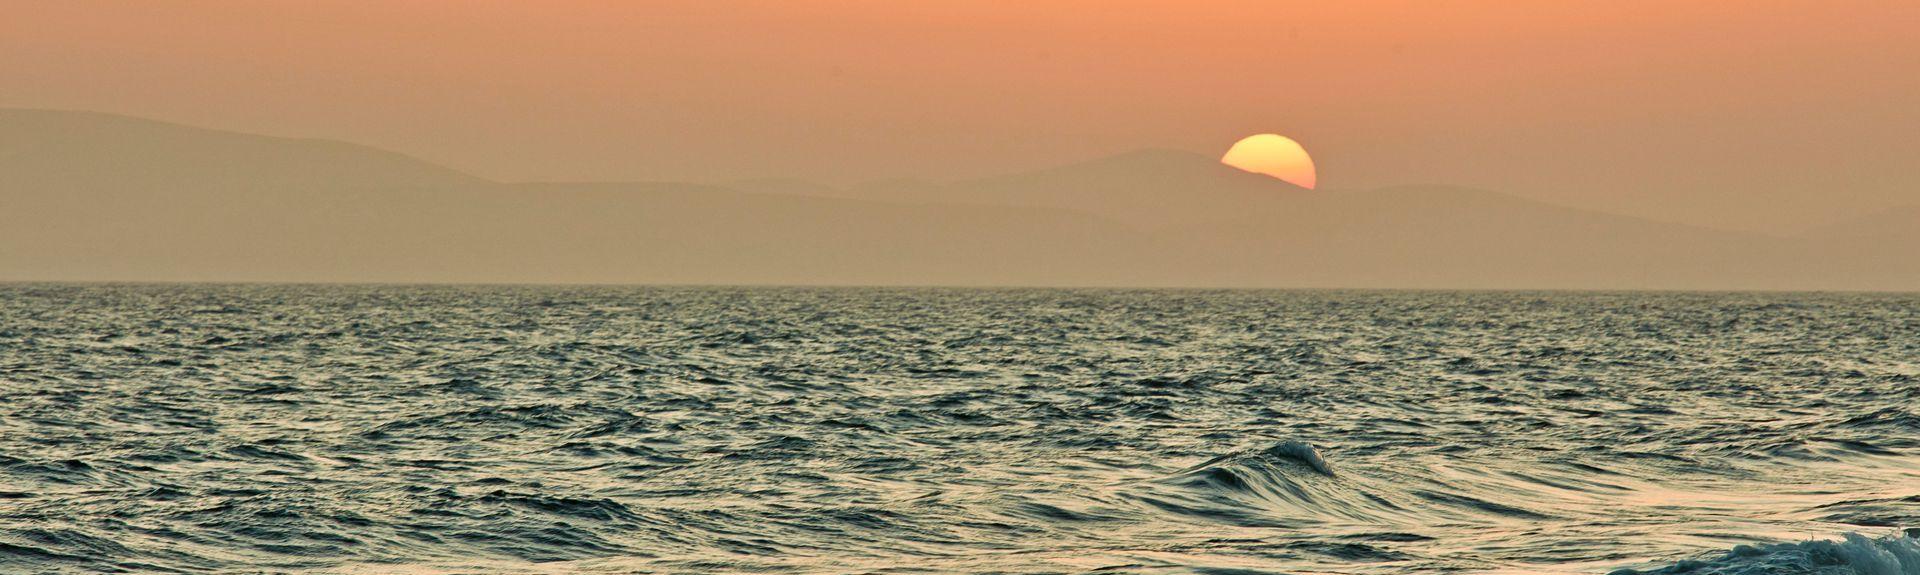 Kostos, Isole egee, Grecia